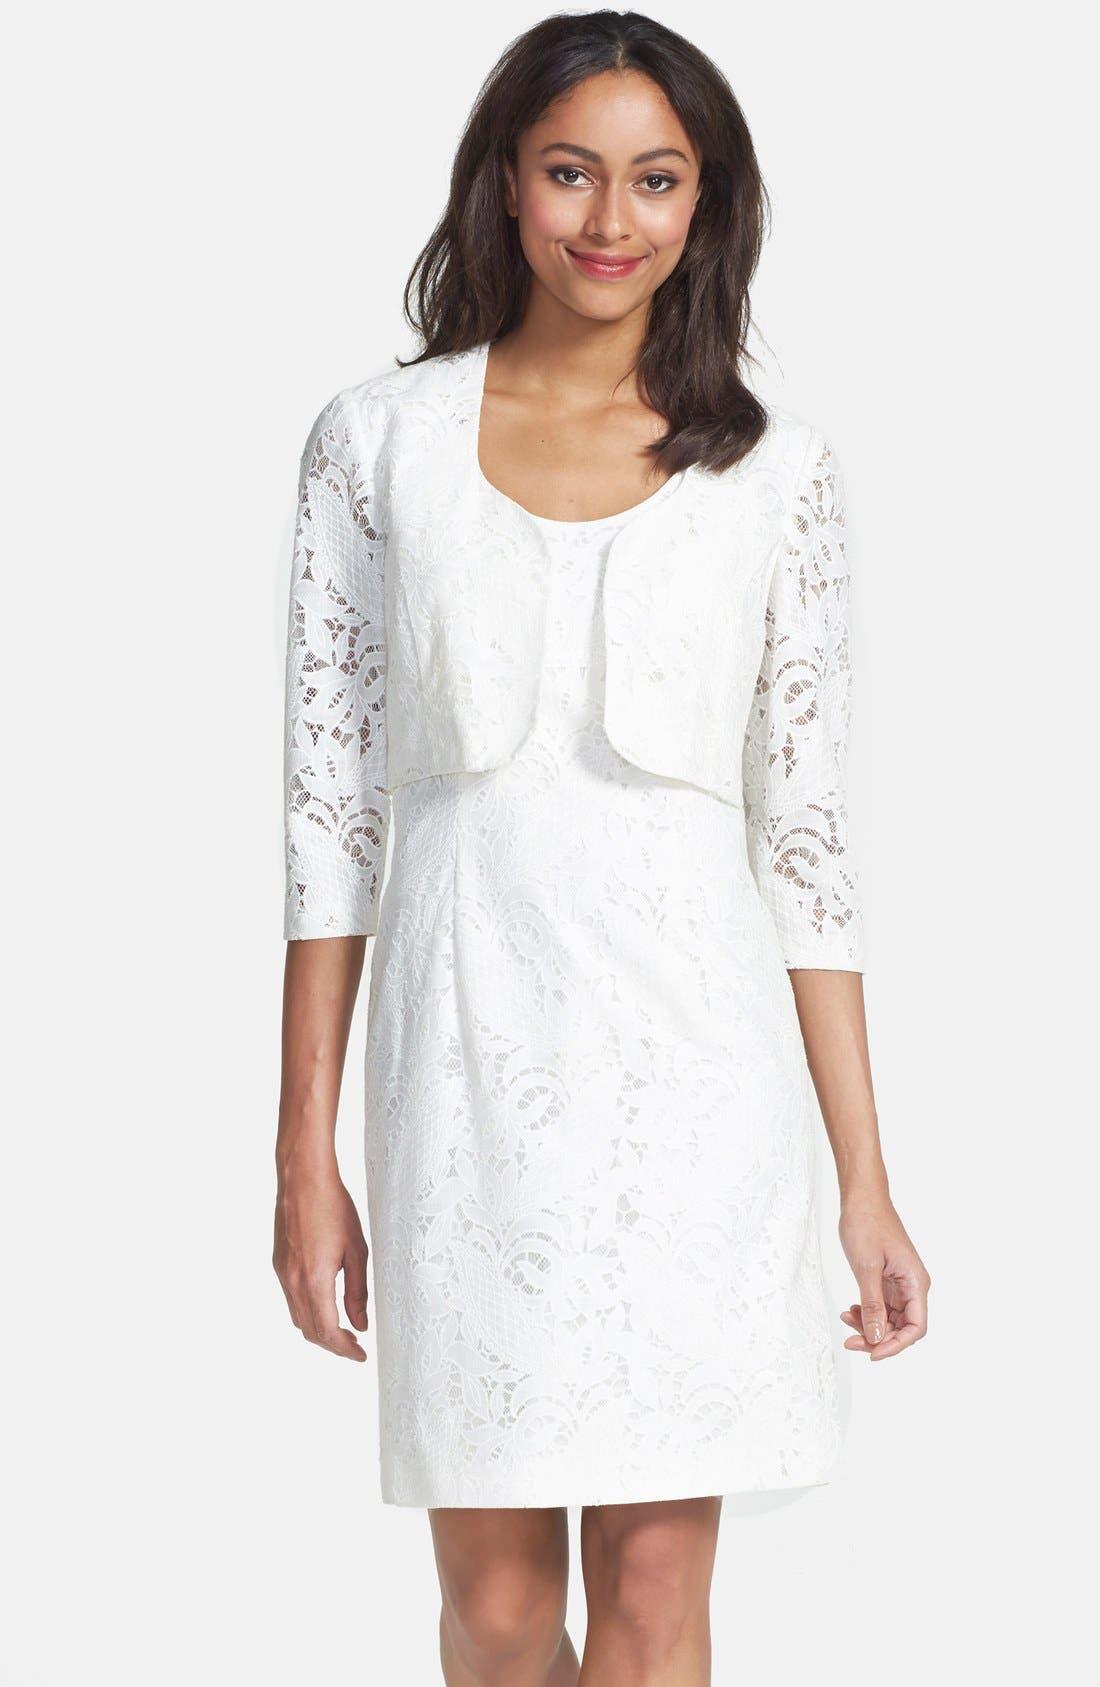 Main Image - Tahari Lace Dress & Jacket